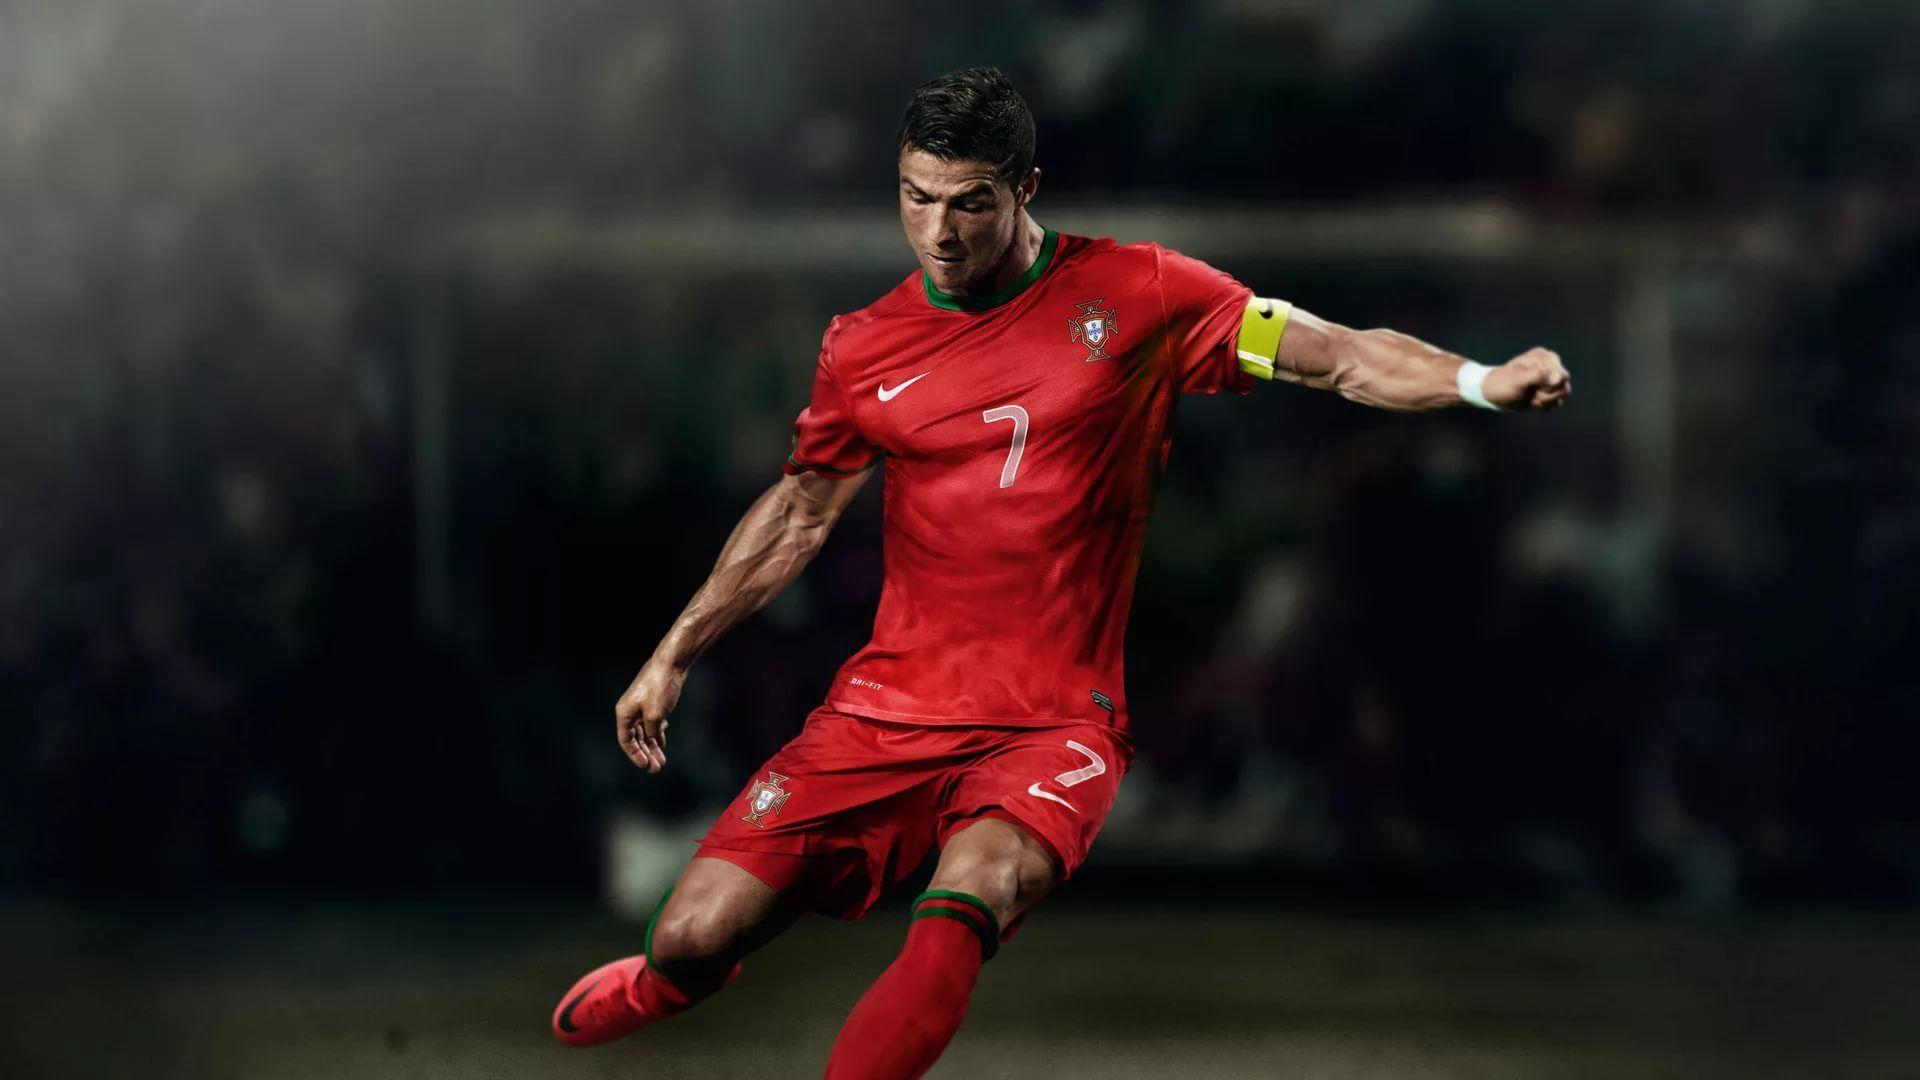 Soccer Player pc wallpaper